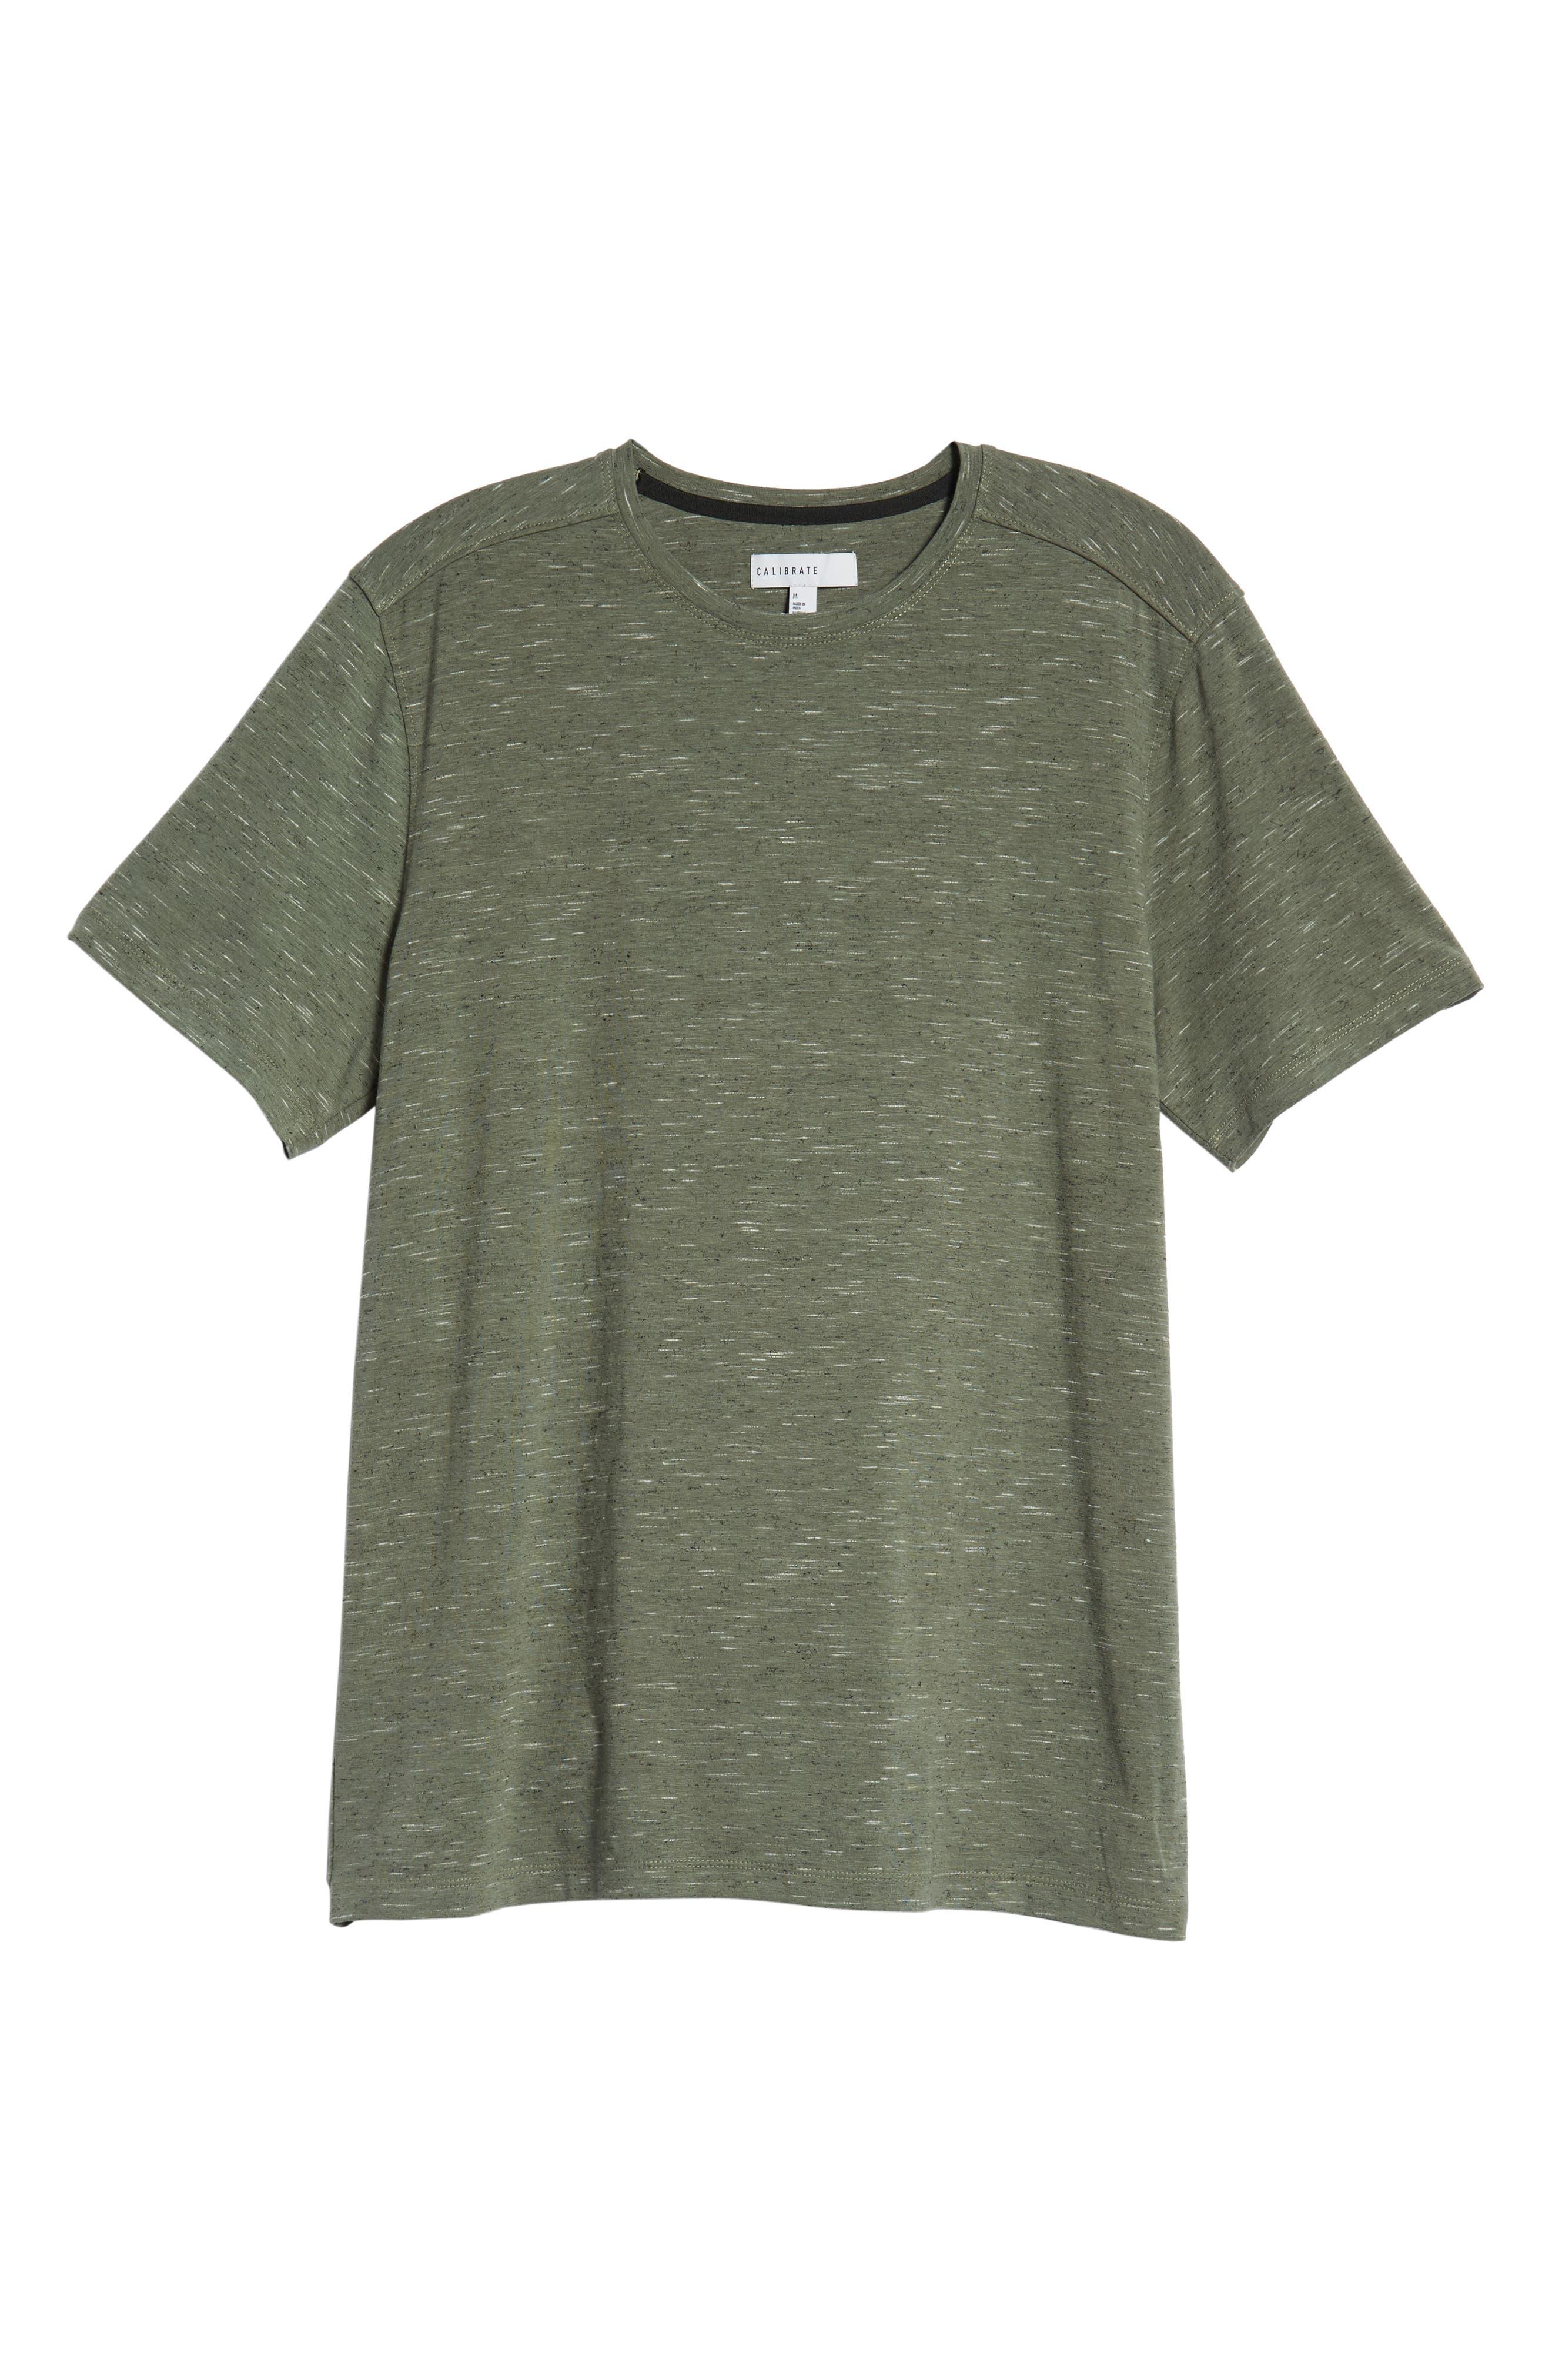 Neppy Crewneck T-Shirt,                             Alternate thumbnail 6, color,                             GREY LUNAR NEP